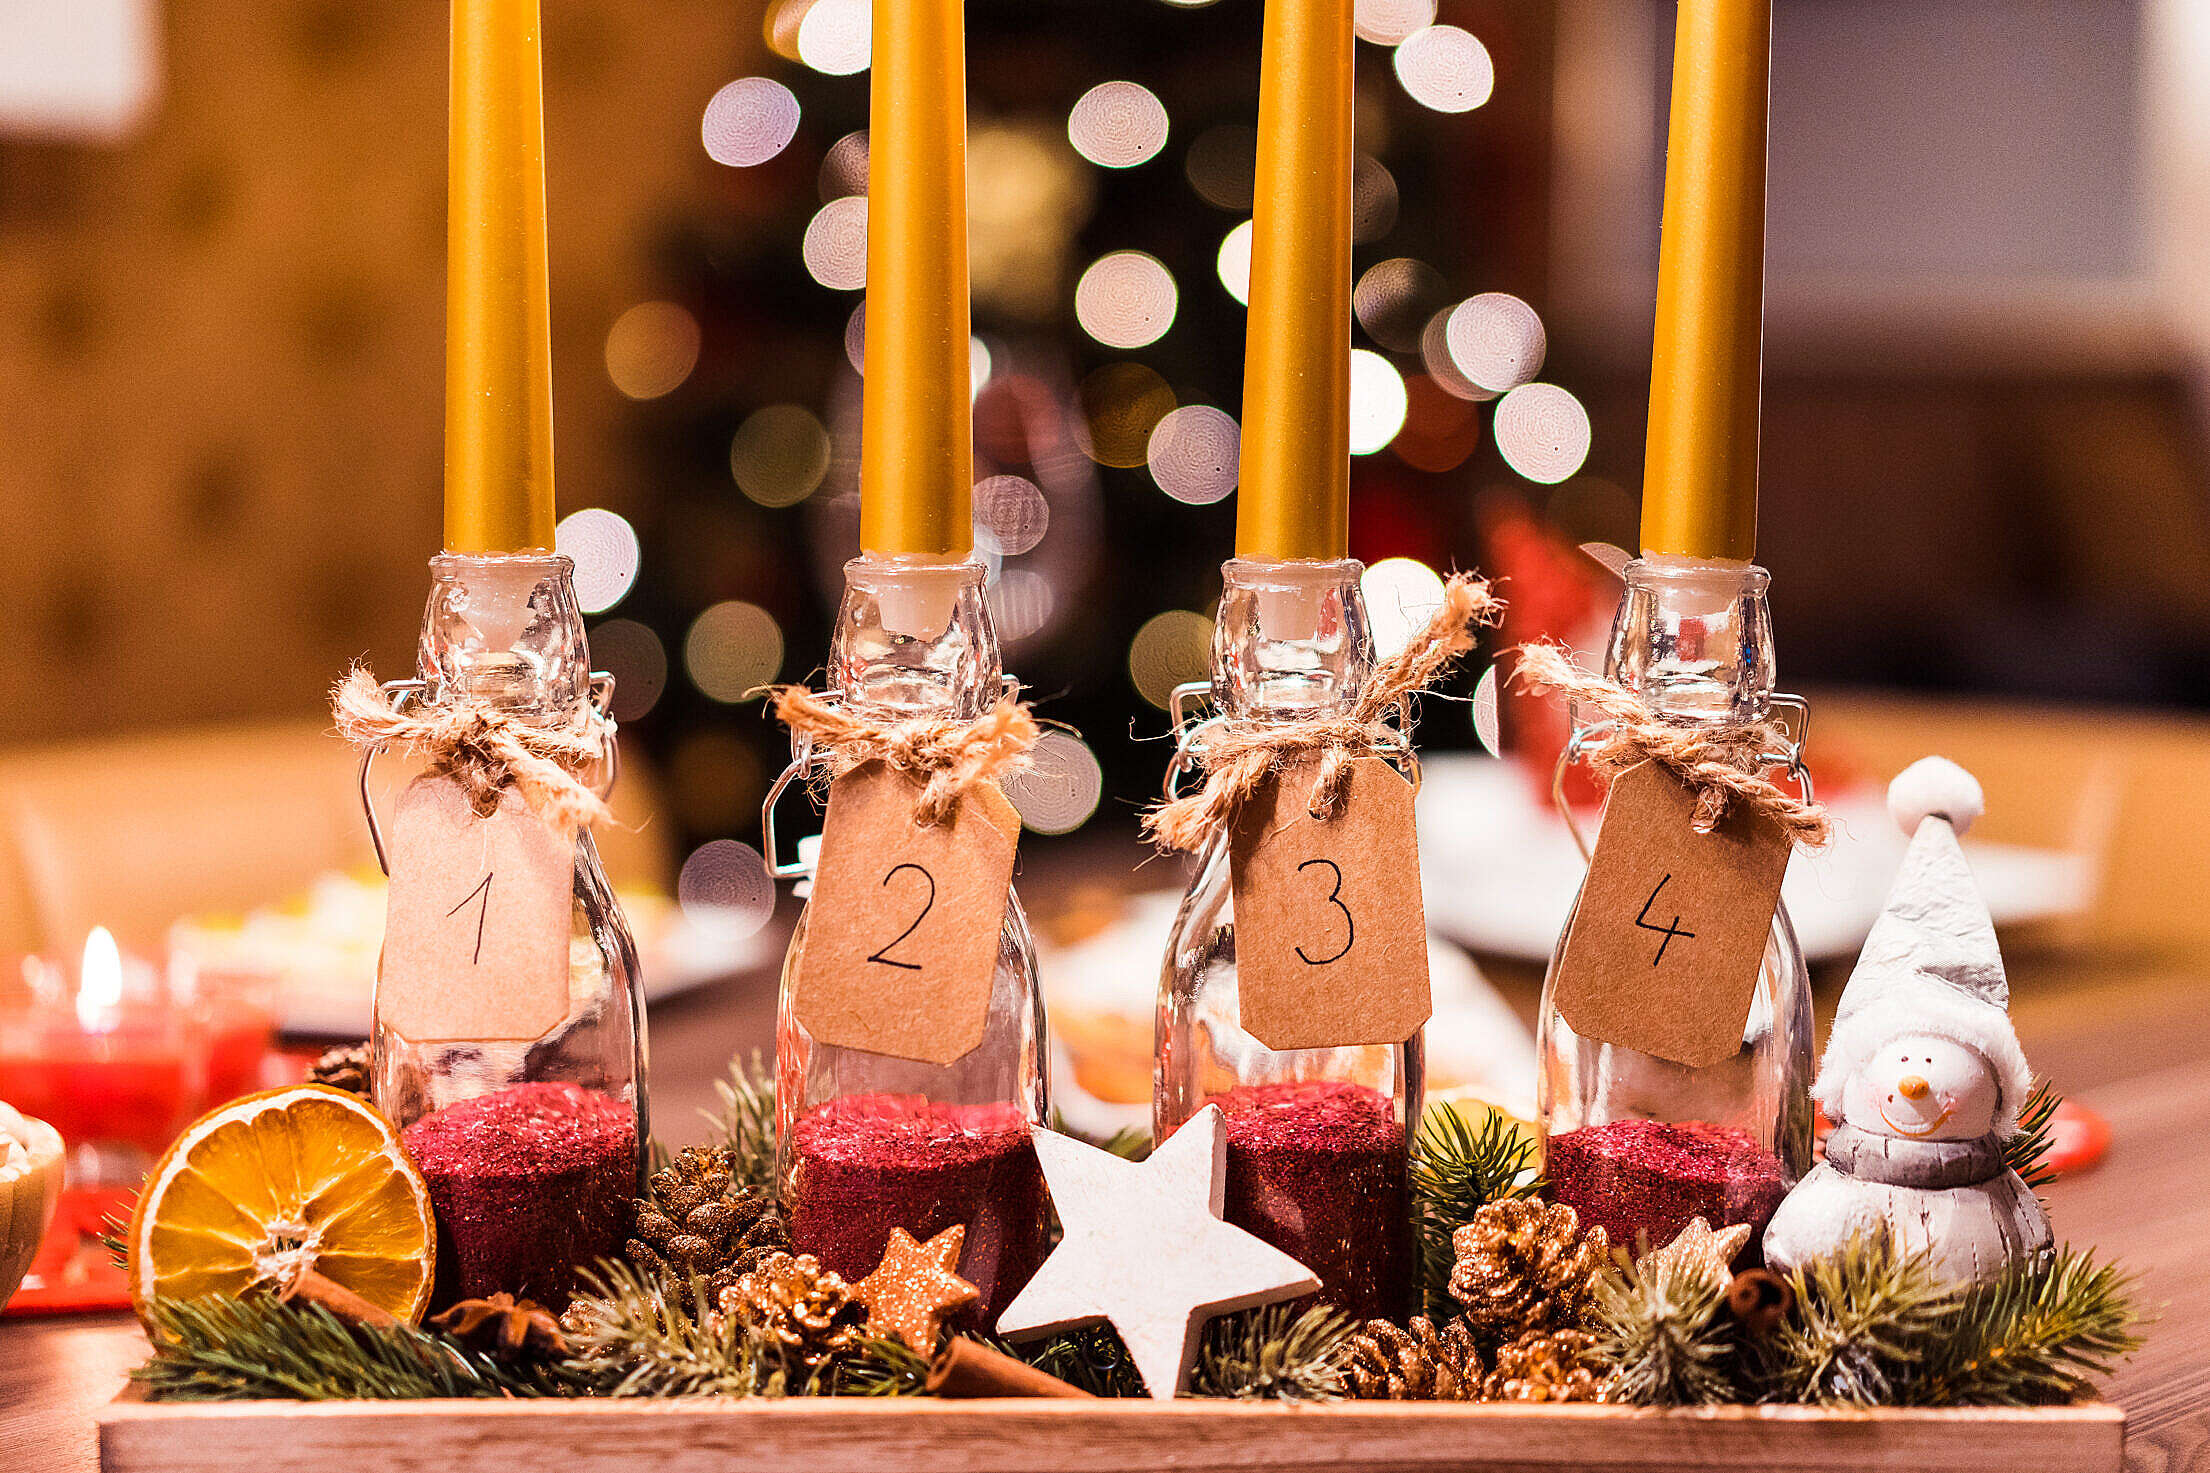 Handmade DIY Advent Candle Free Stock Photo